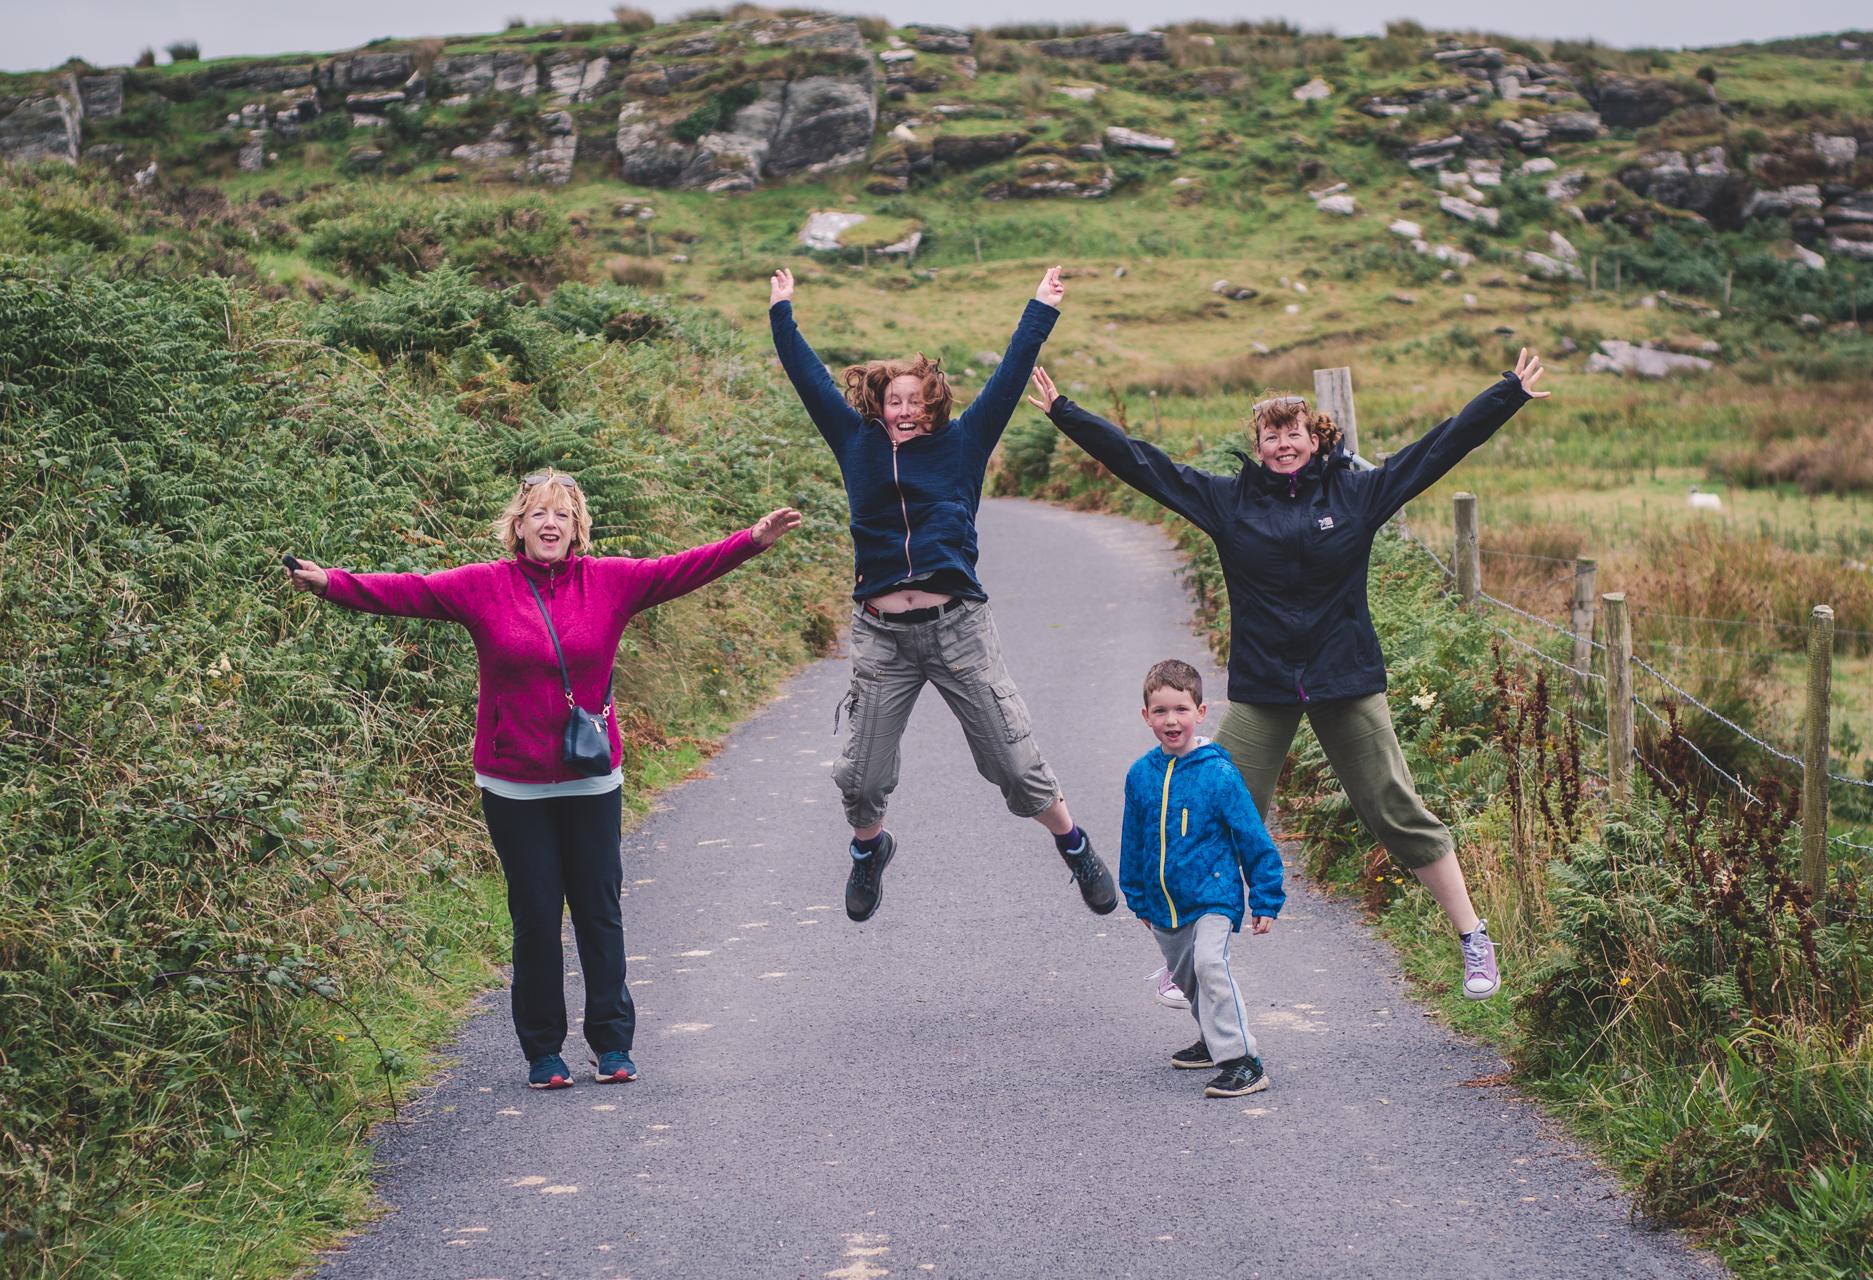 Ireland. Wild Atlantic Way. Kerry. Counthy Kerry. Travel photography. Landscape photography. Blog. Irish. Travelling Ireland. Ireland west coast. Wild Landscape. Trip. Vacation. -20.jpg